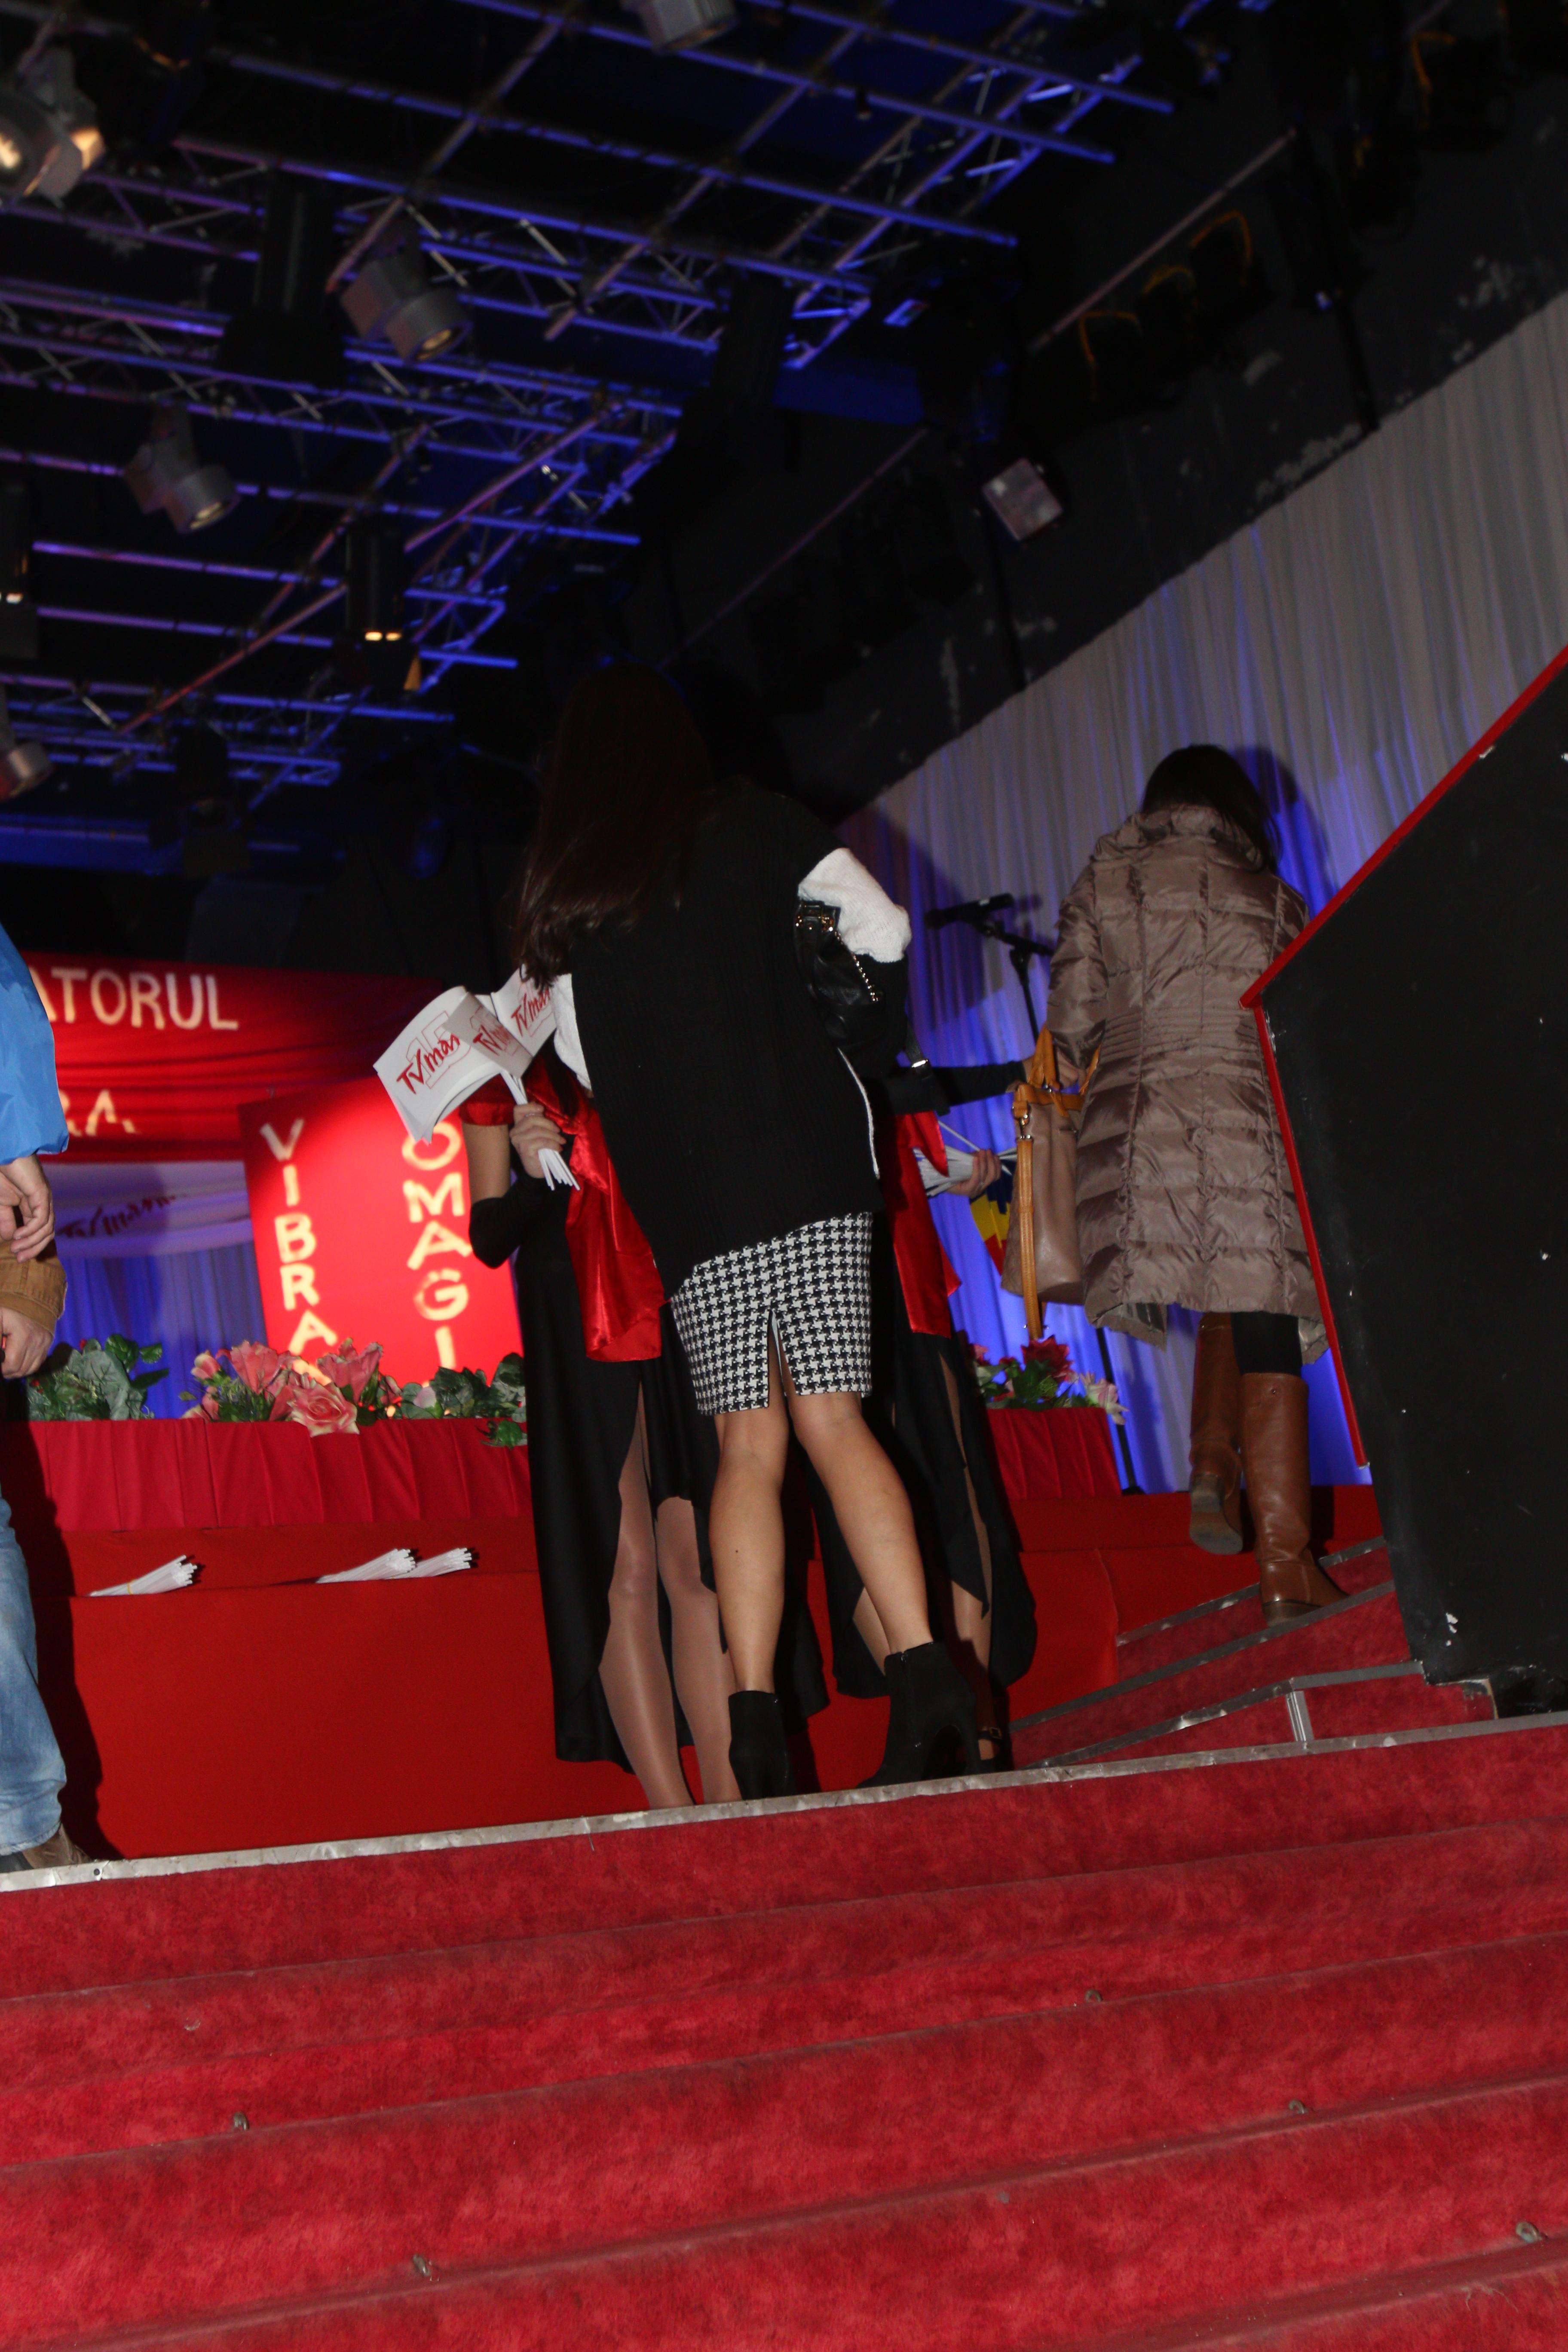 Cum a ajuns la teatru, Alina s-a dus tinta in sala, unde si-a cautat colegii